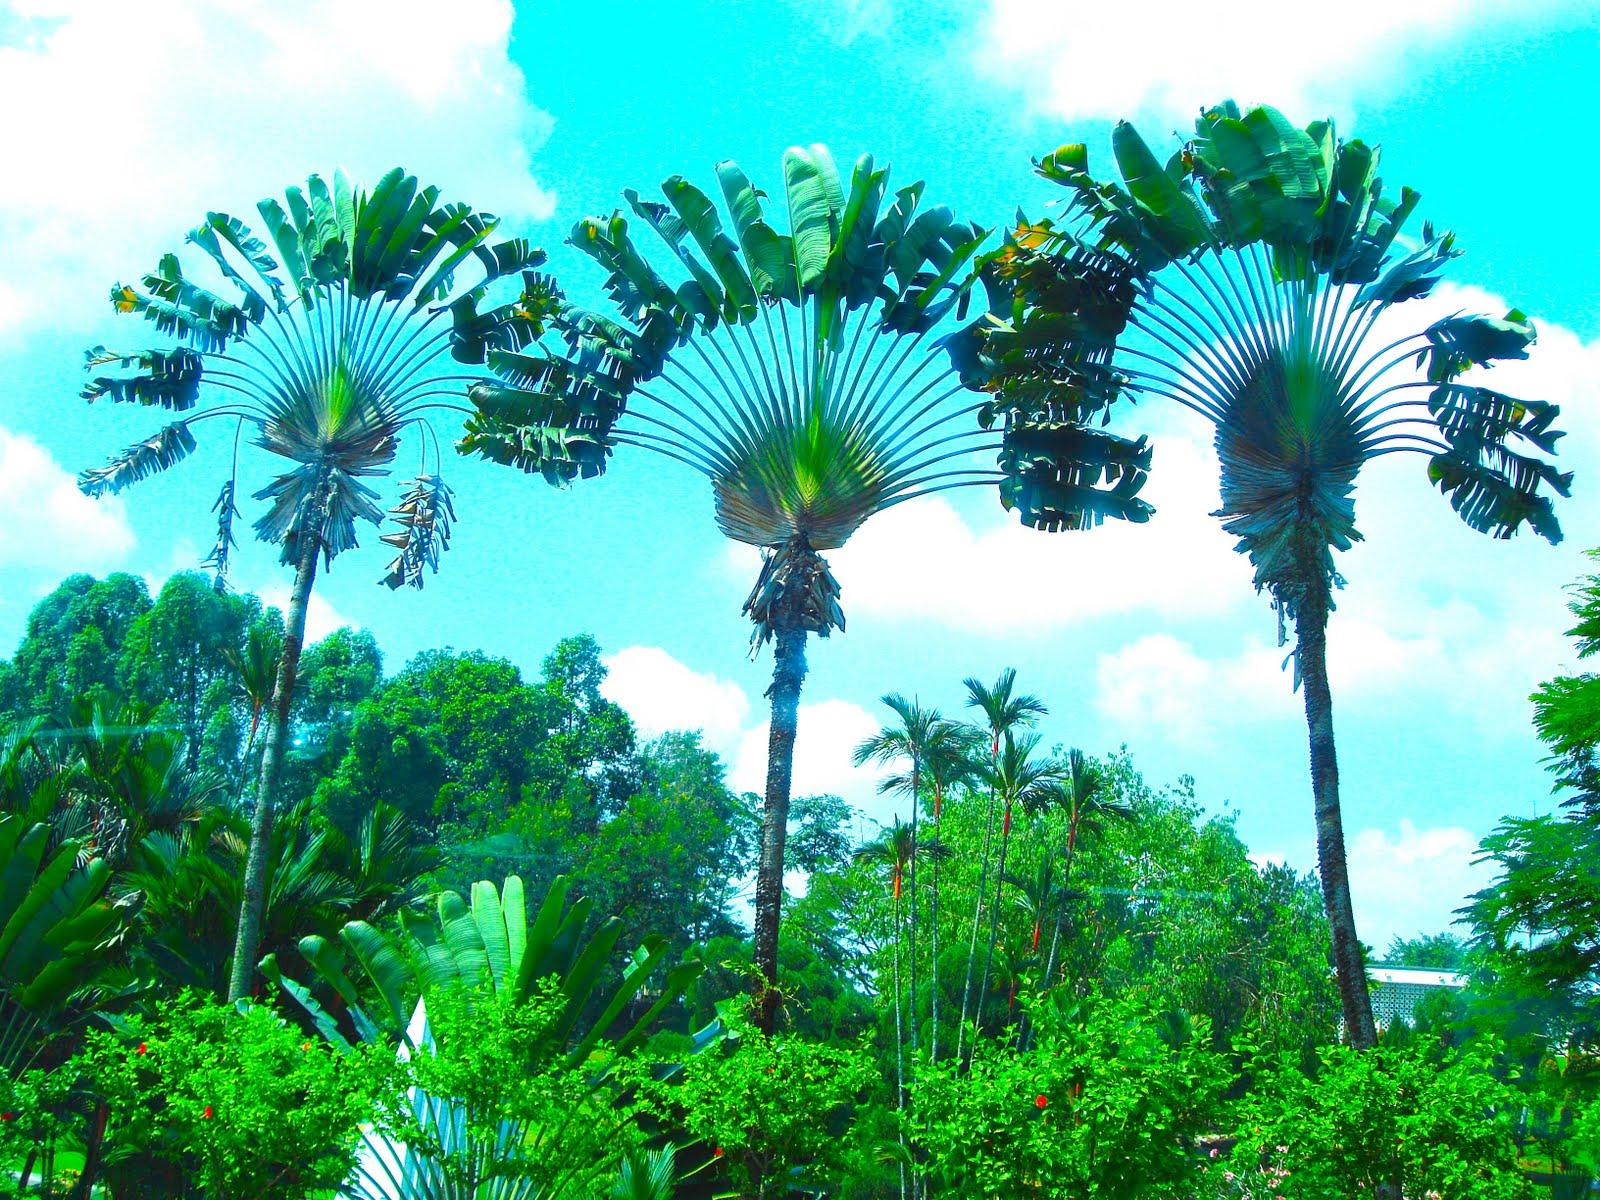 http://2.bp.blogspot.com/-rmH--Ve4qI0/TfLRwHV5kkI/AAAAAAAADDY/KL8ZOPUEWL4/s1600/palm-trees-1.jpg